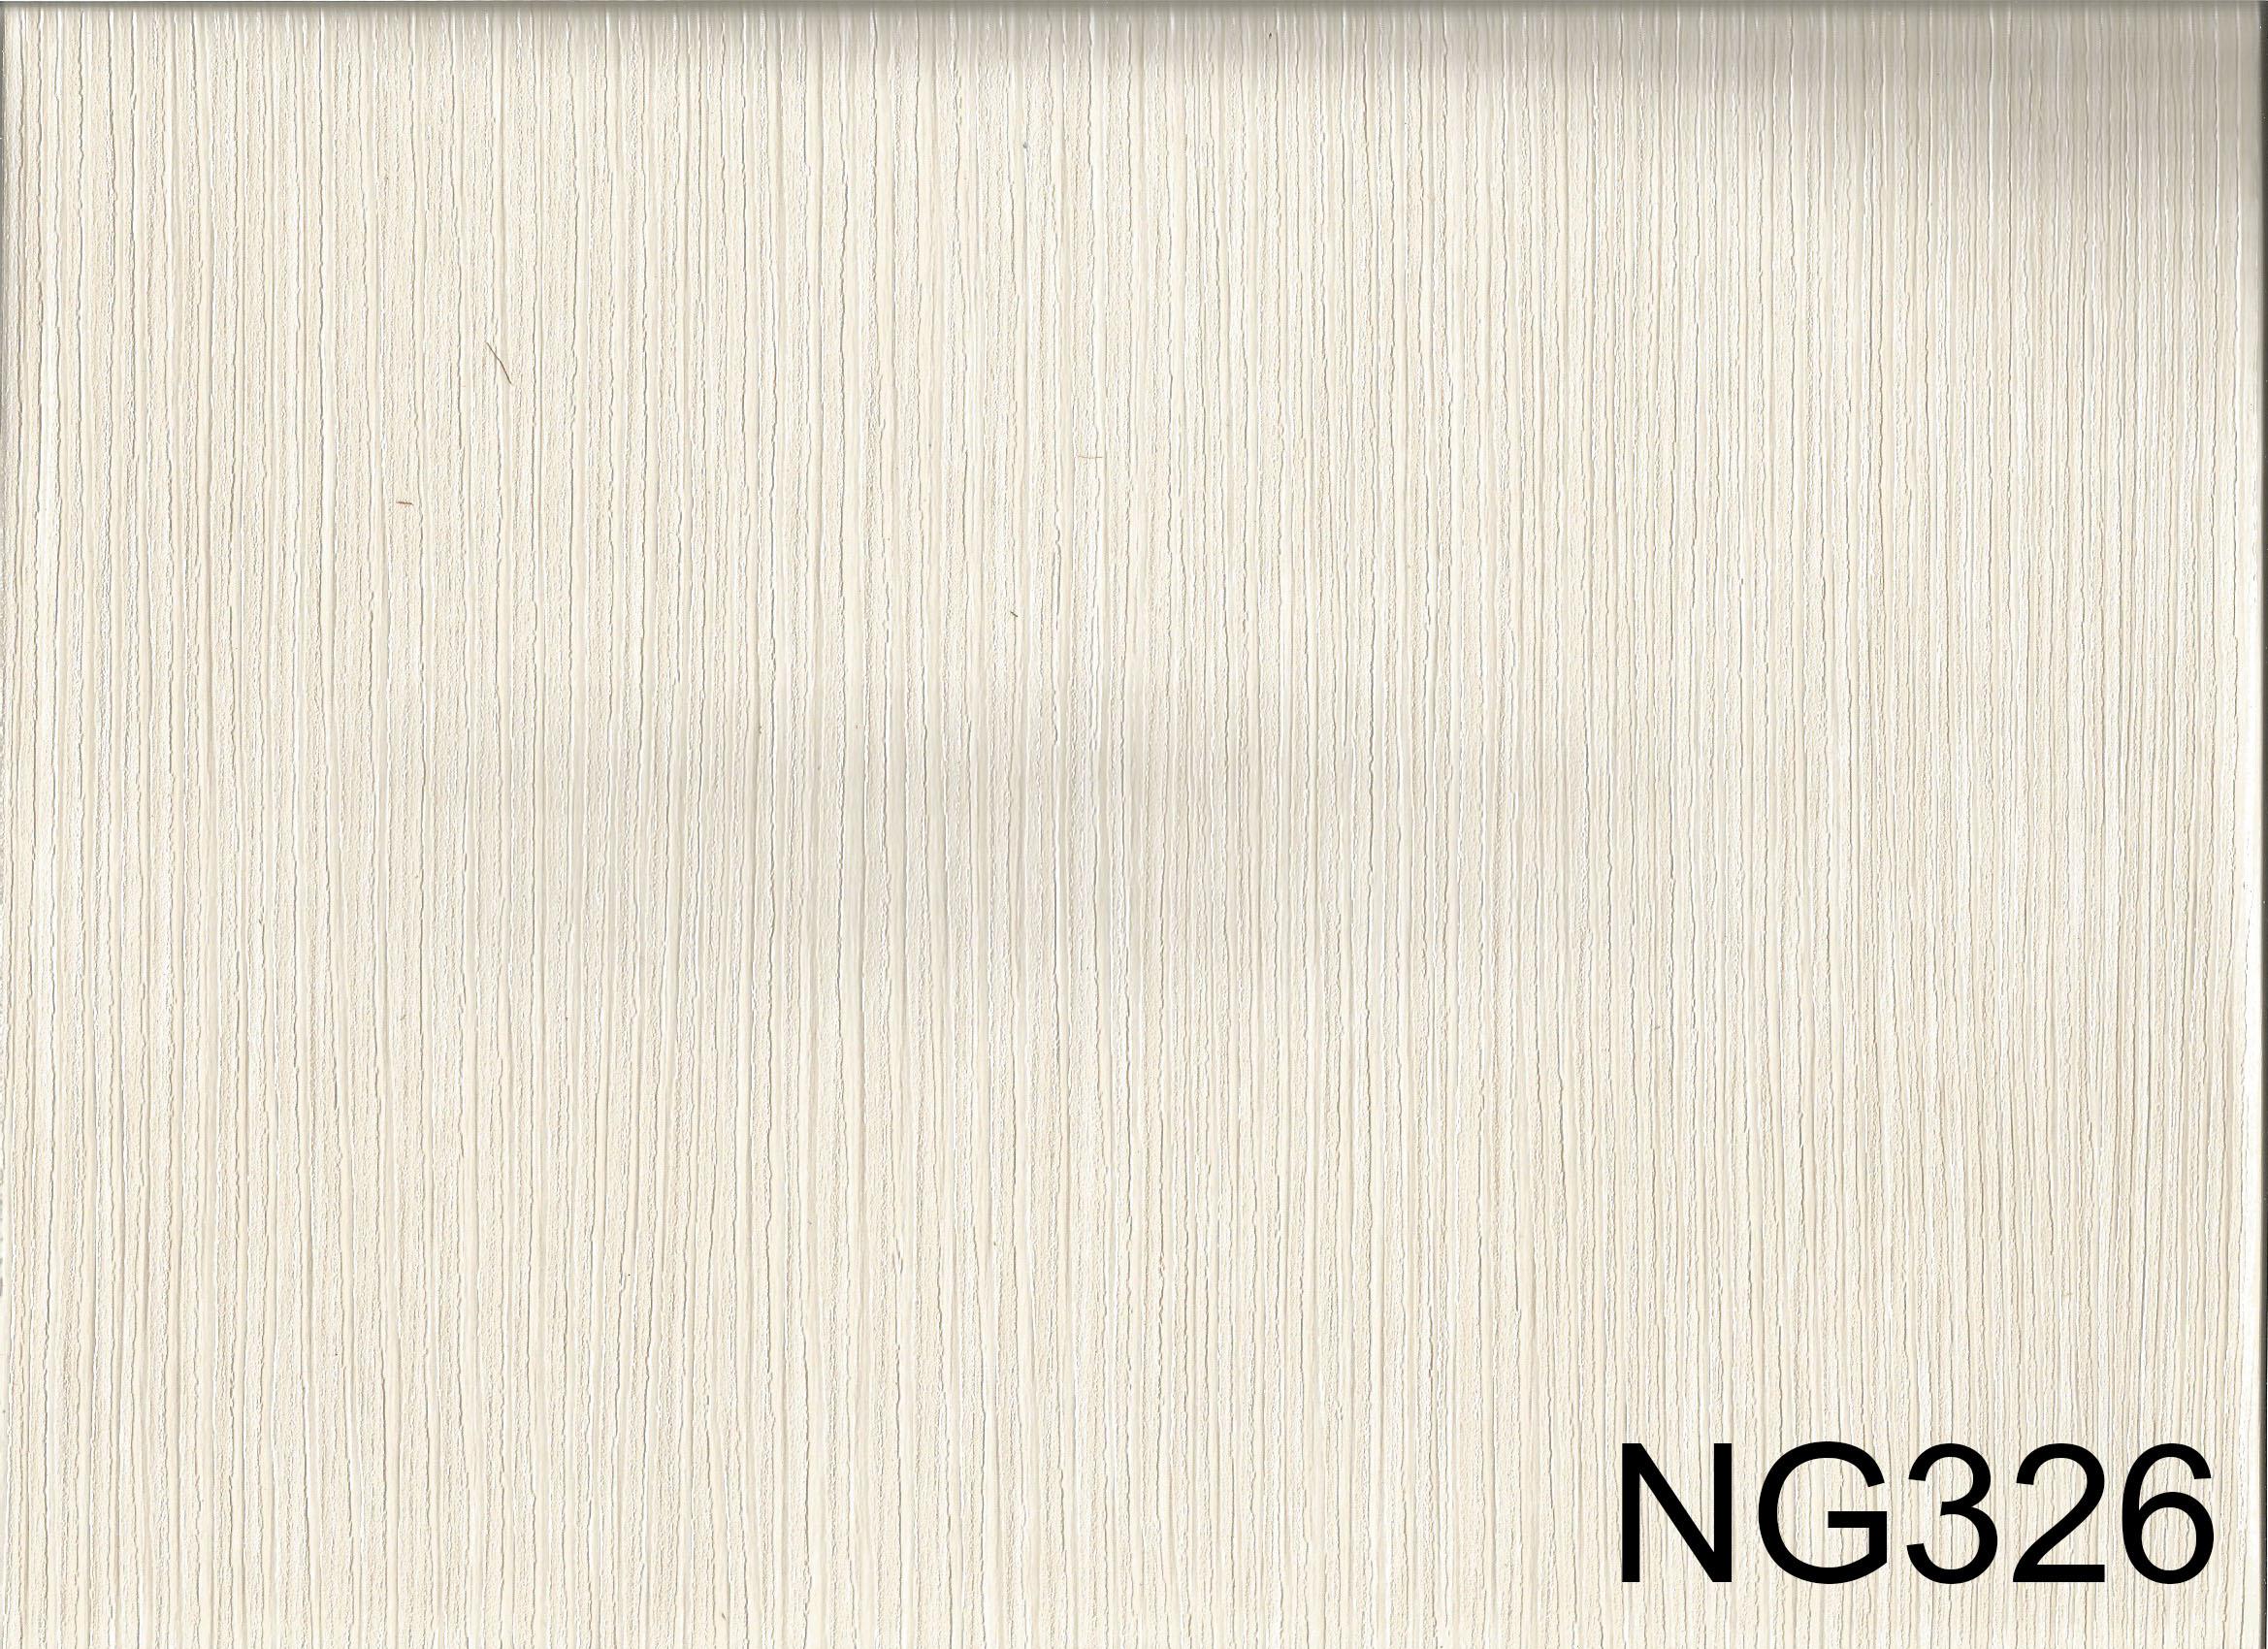 NG326